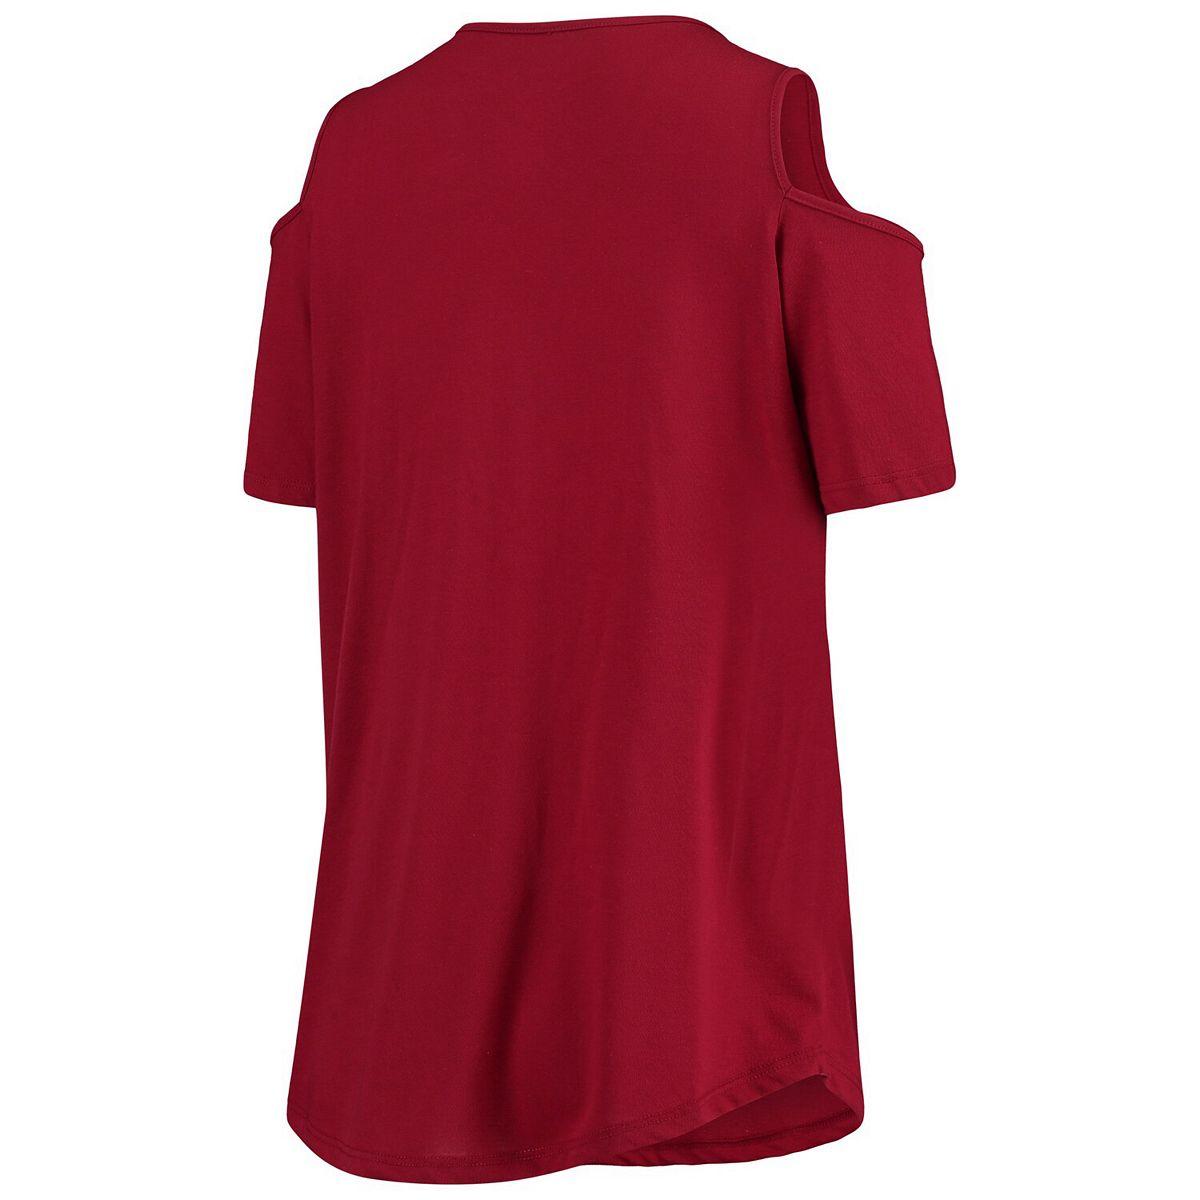 Women's Crimson Oklahoma Sooners Plus Size Cold Shoulder T-Shirt weRKT